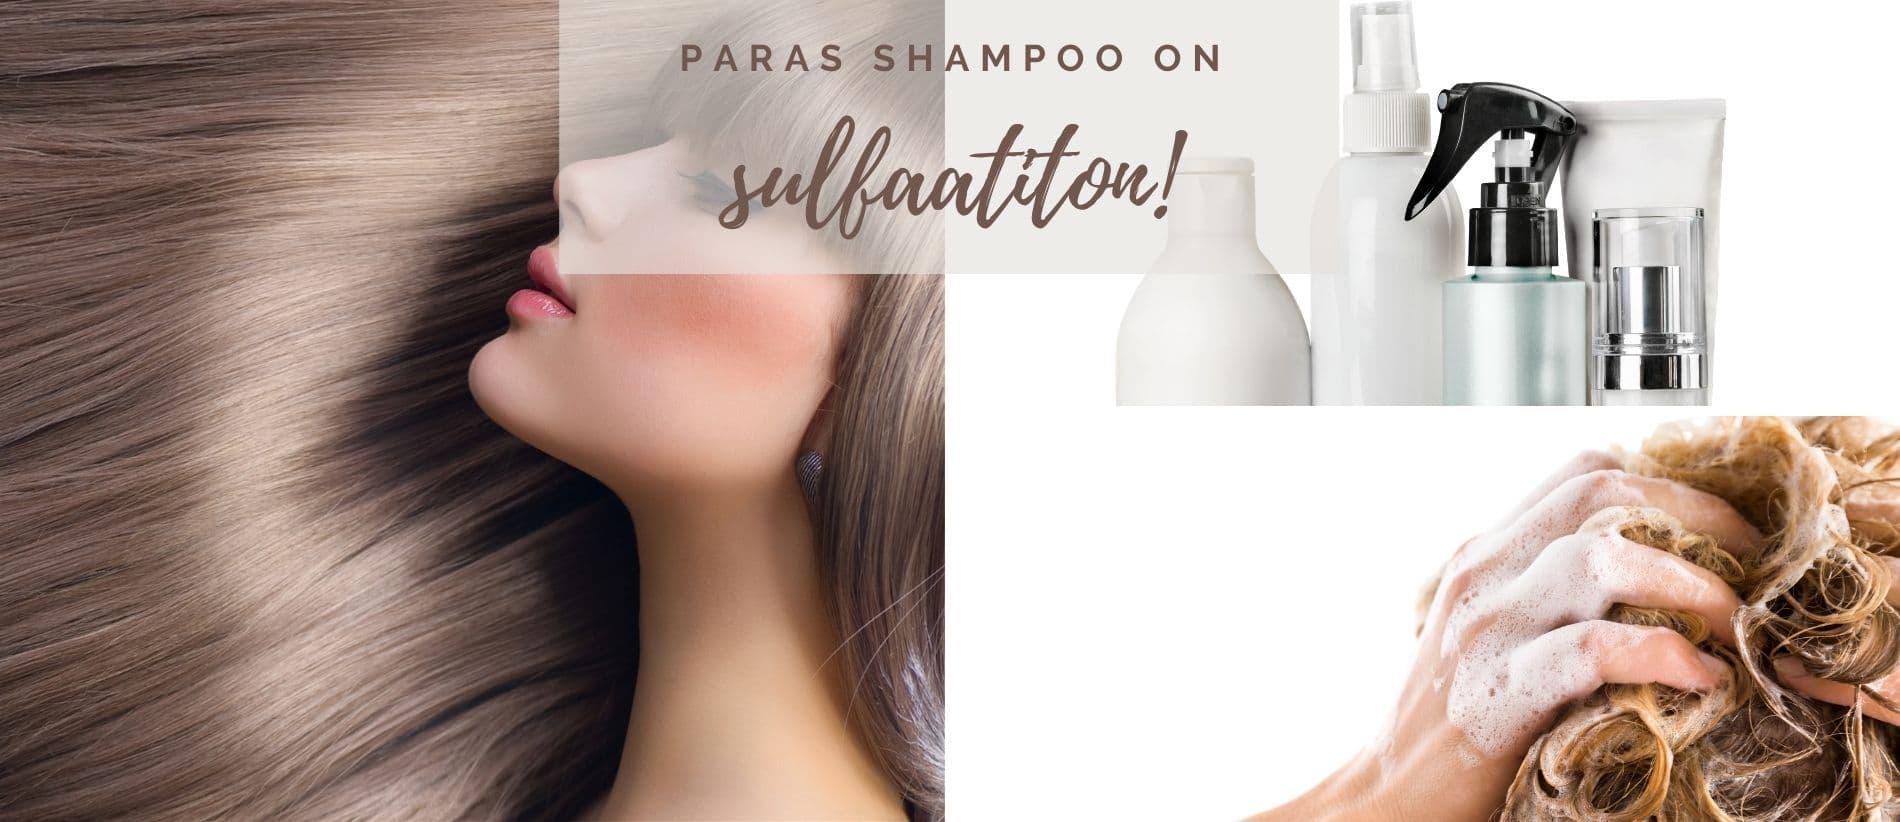 paras shampoo on sulfaatiton